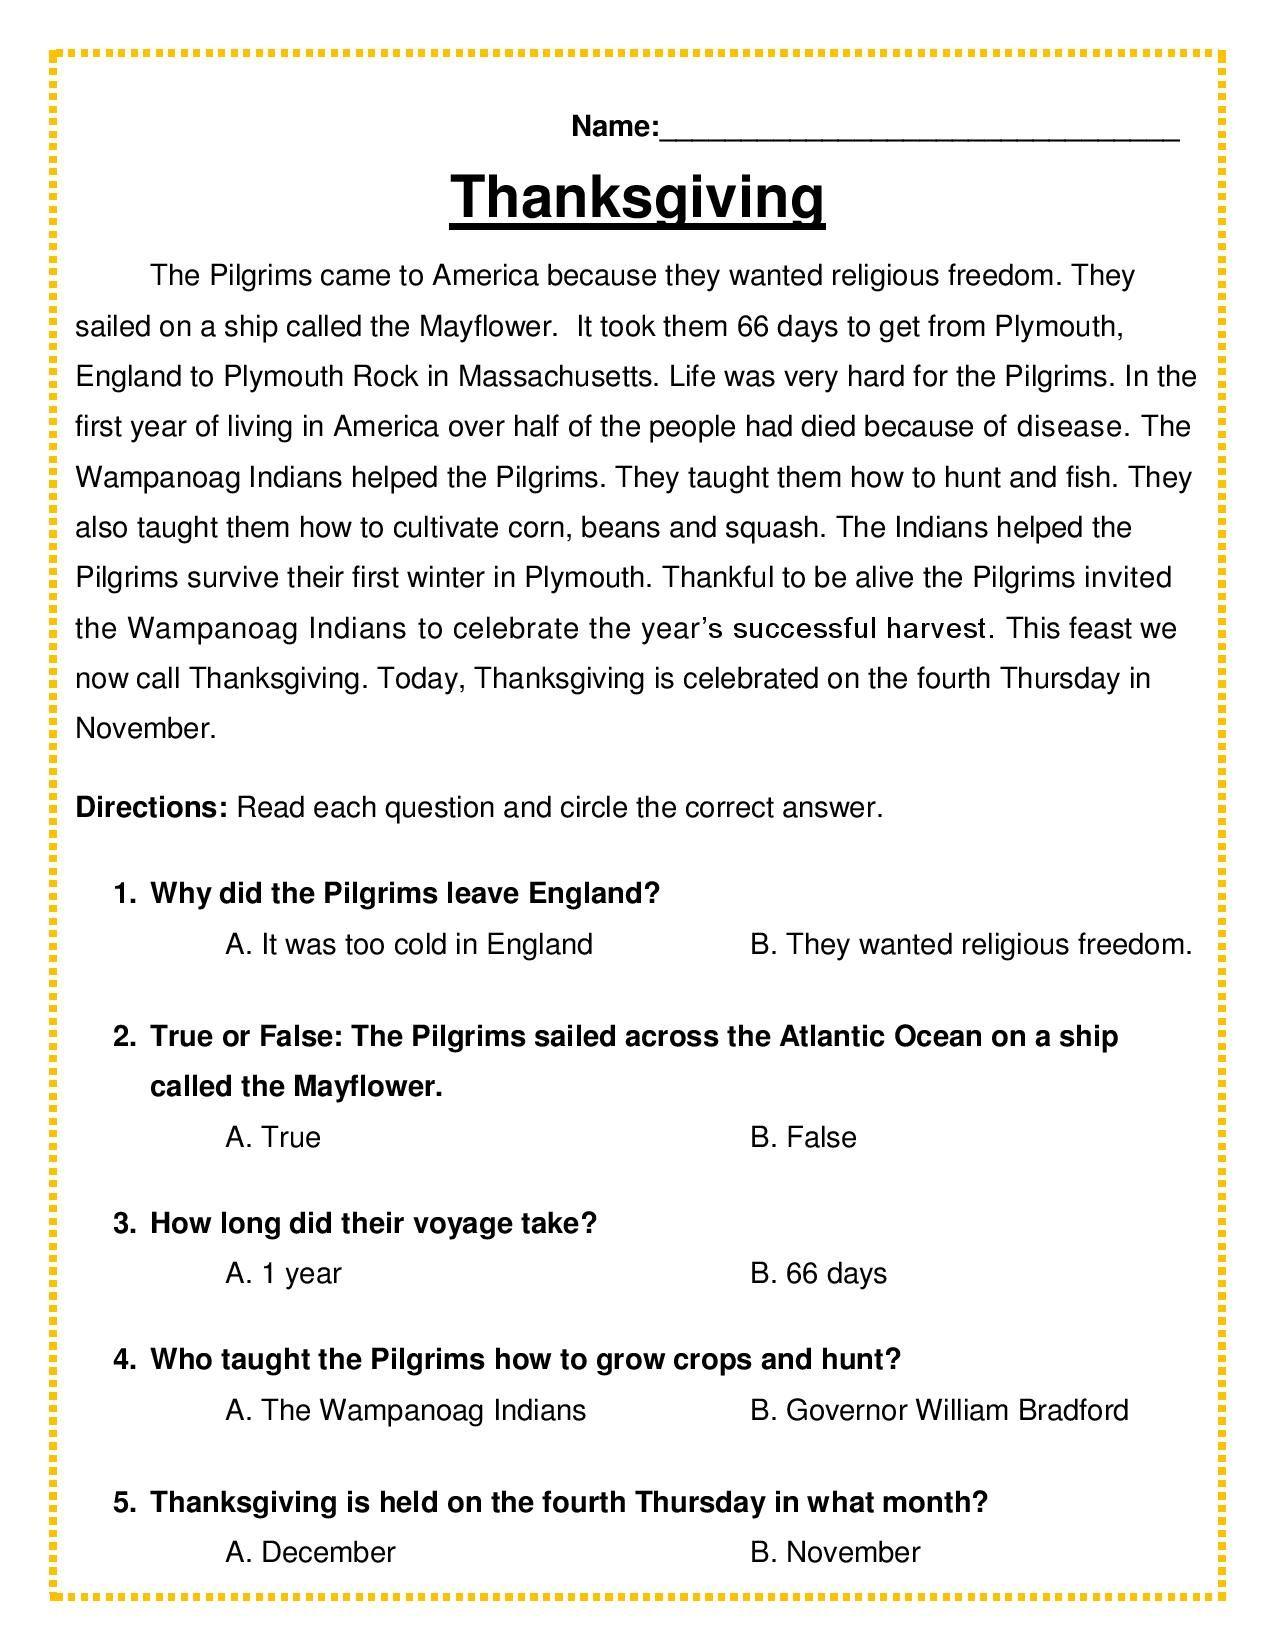 Thanksgiving Quiz Easy Thanksgiving Passages Multiple Choice Thanksgiving Quiz [ 1650 x 1275 Pixel ]